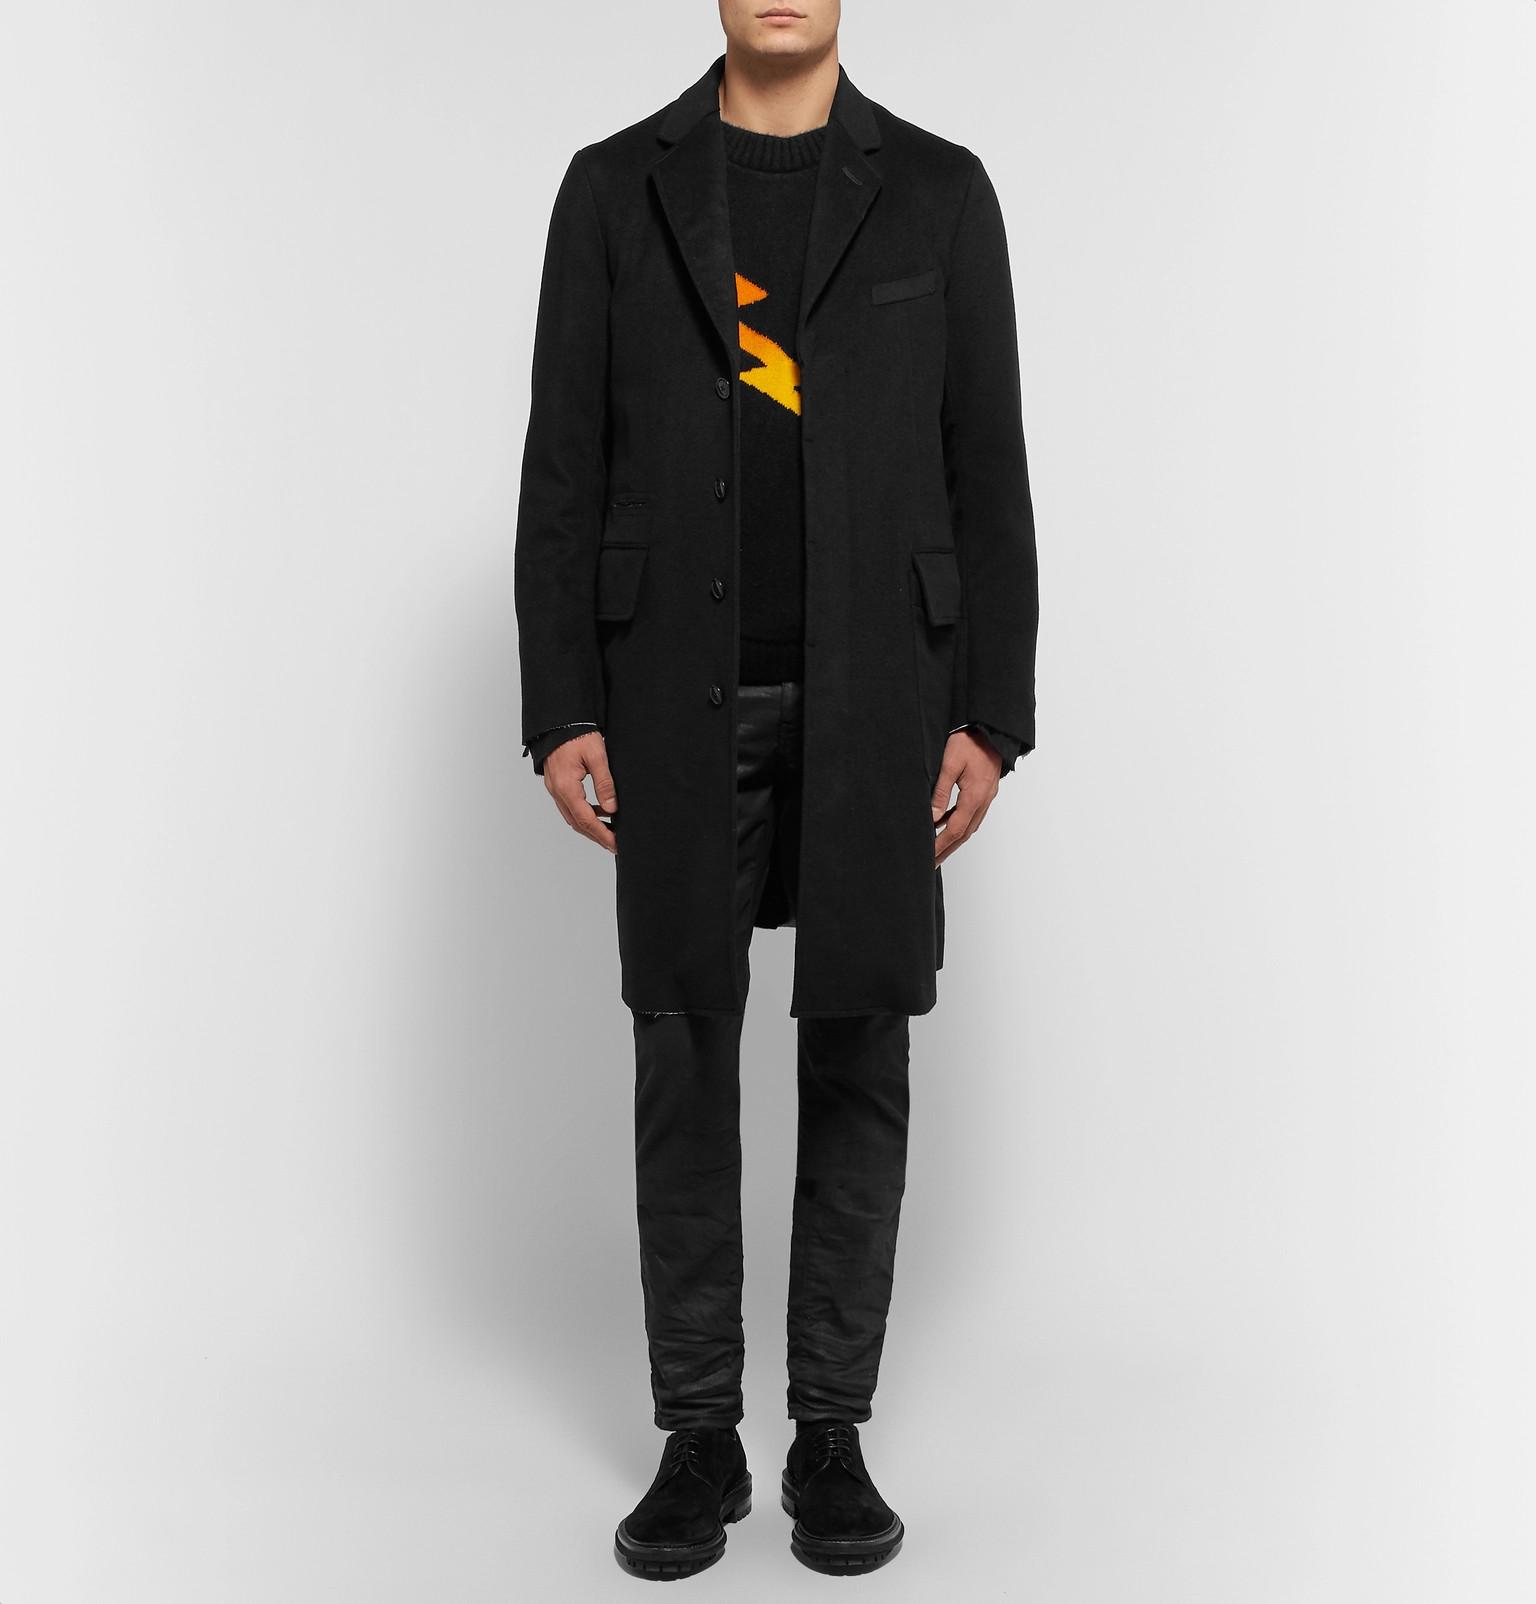 Thesoloist Cashmere Fit Blend Slim Coat Black And Takahiromiyashita tpdqqP